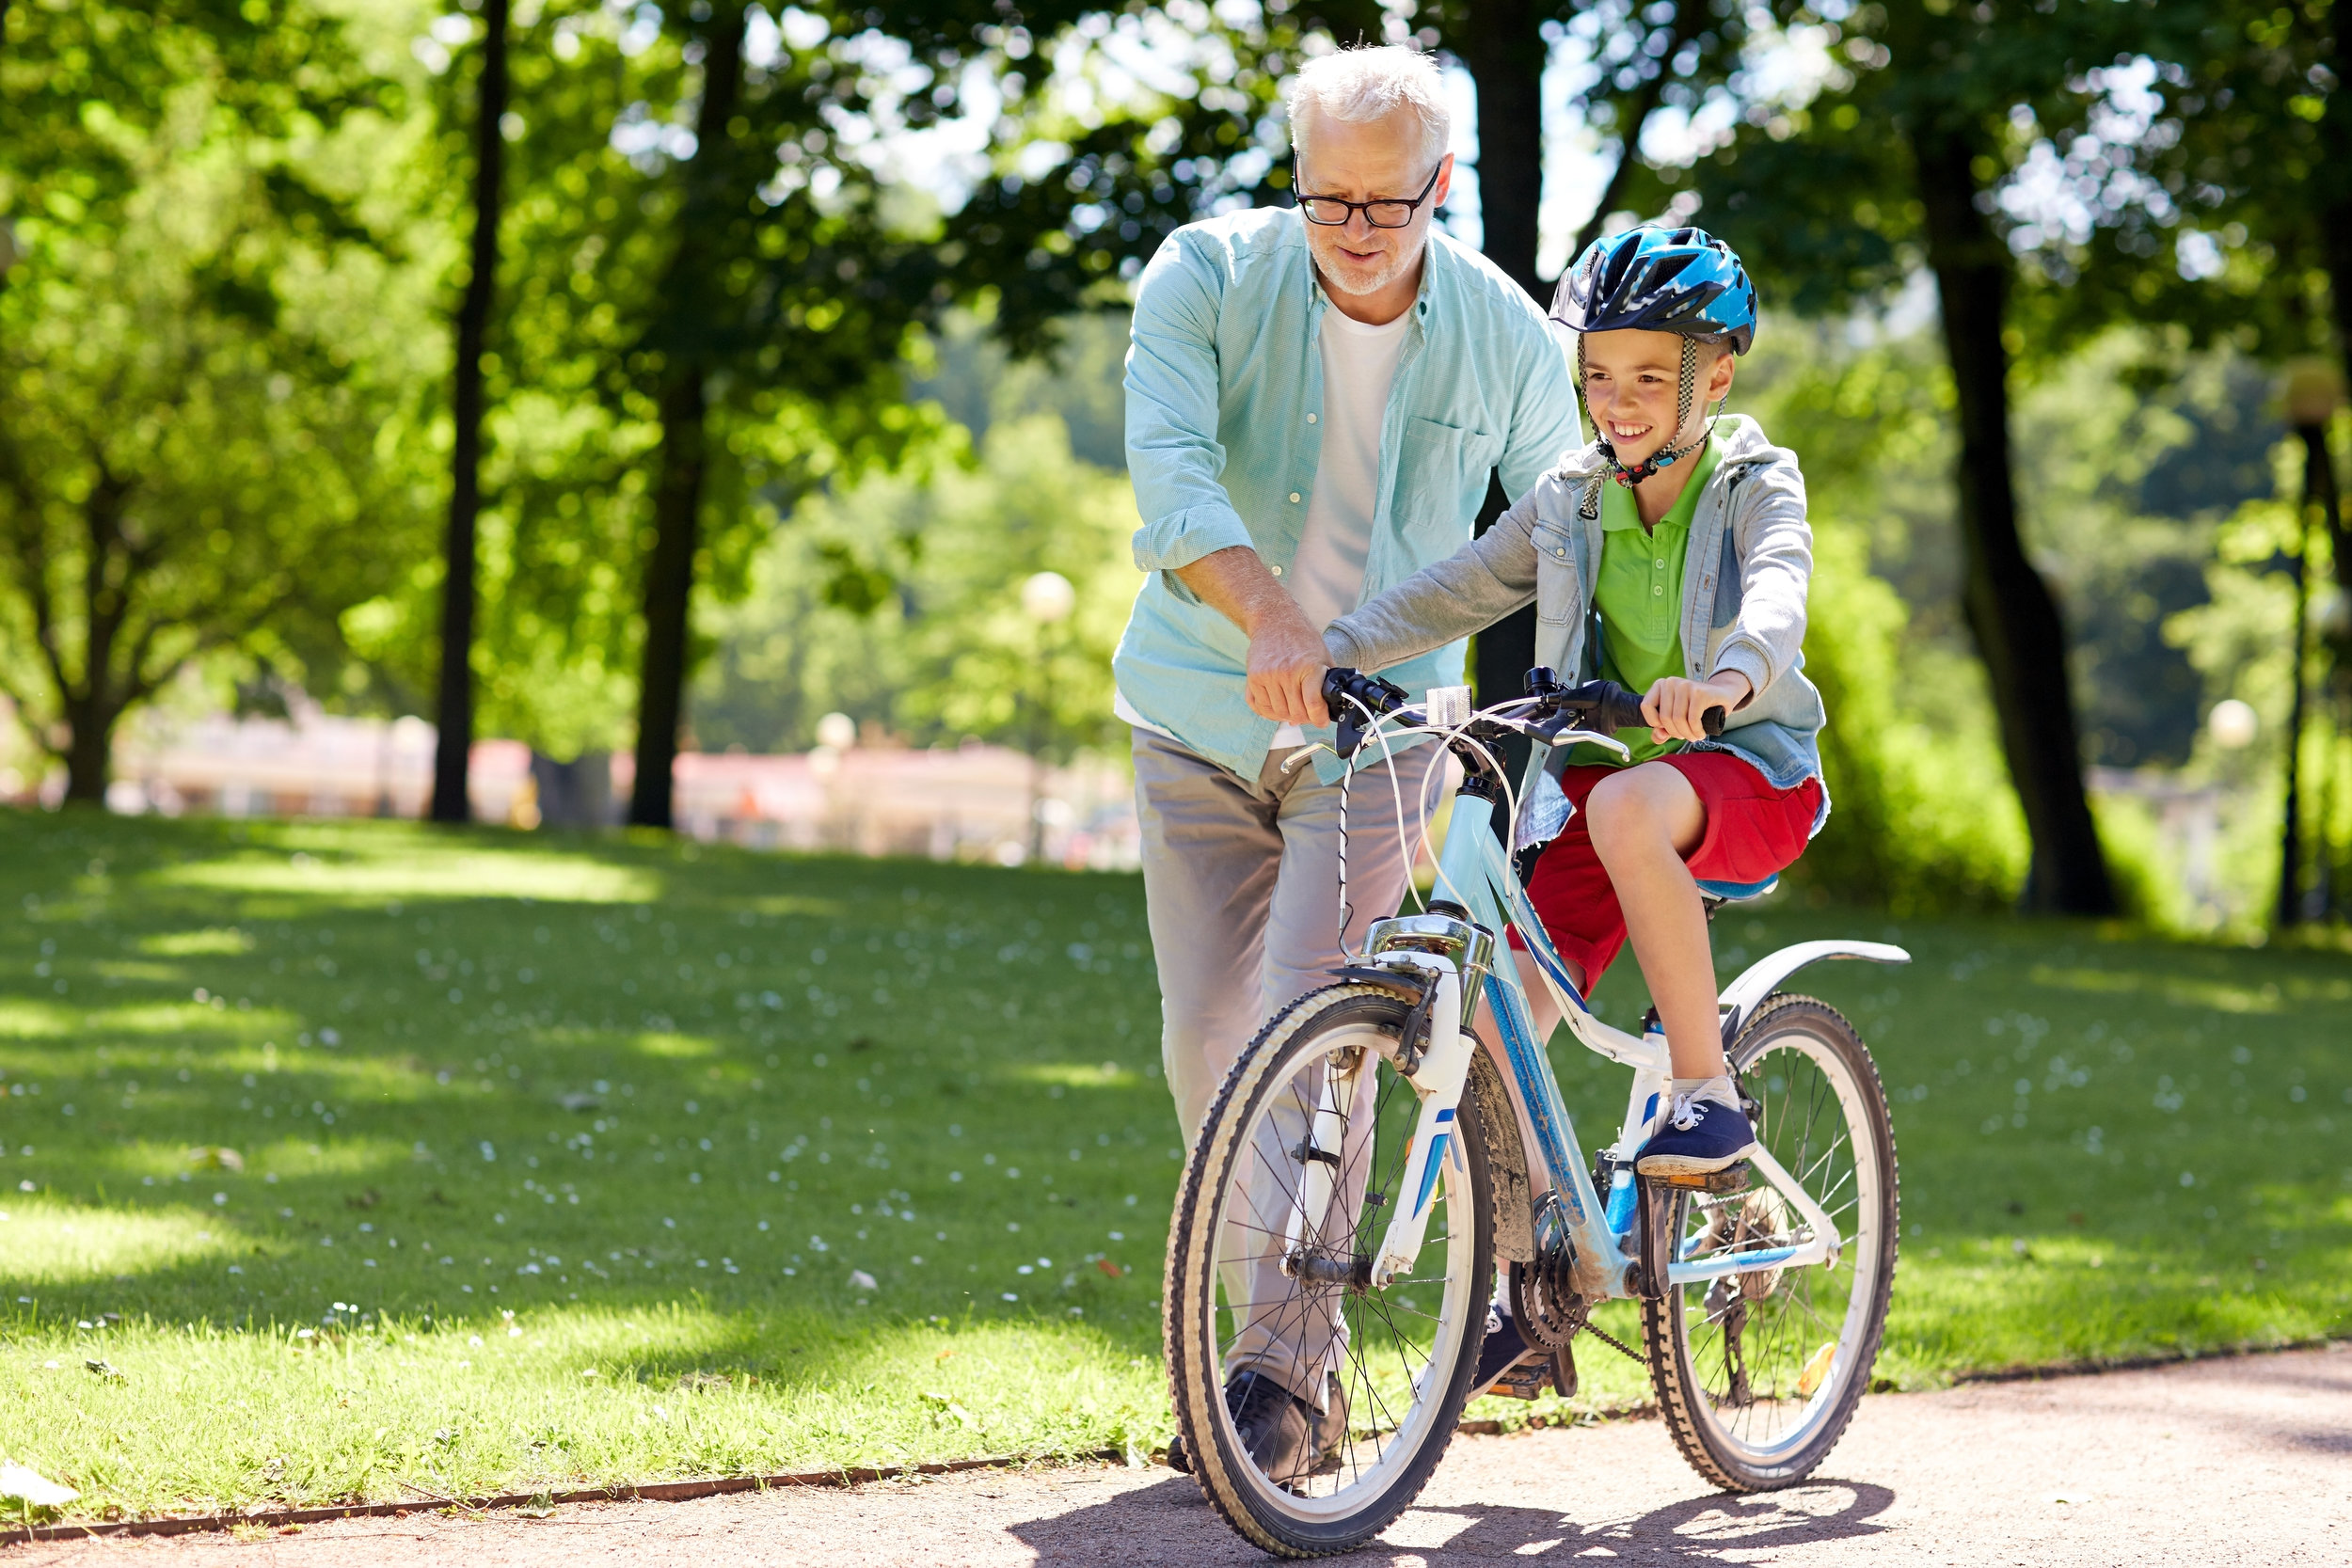 Adult teaching boy how to ride a bike